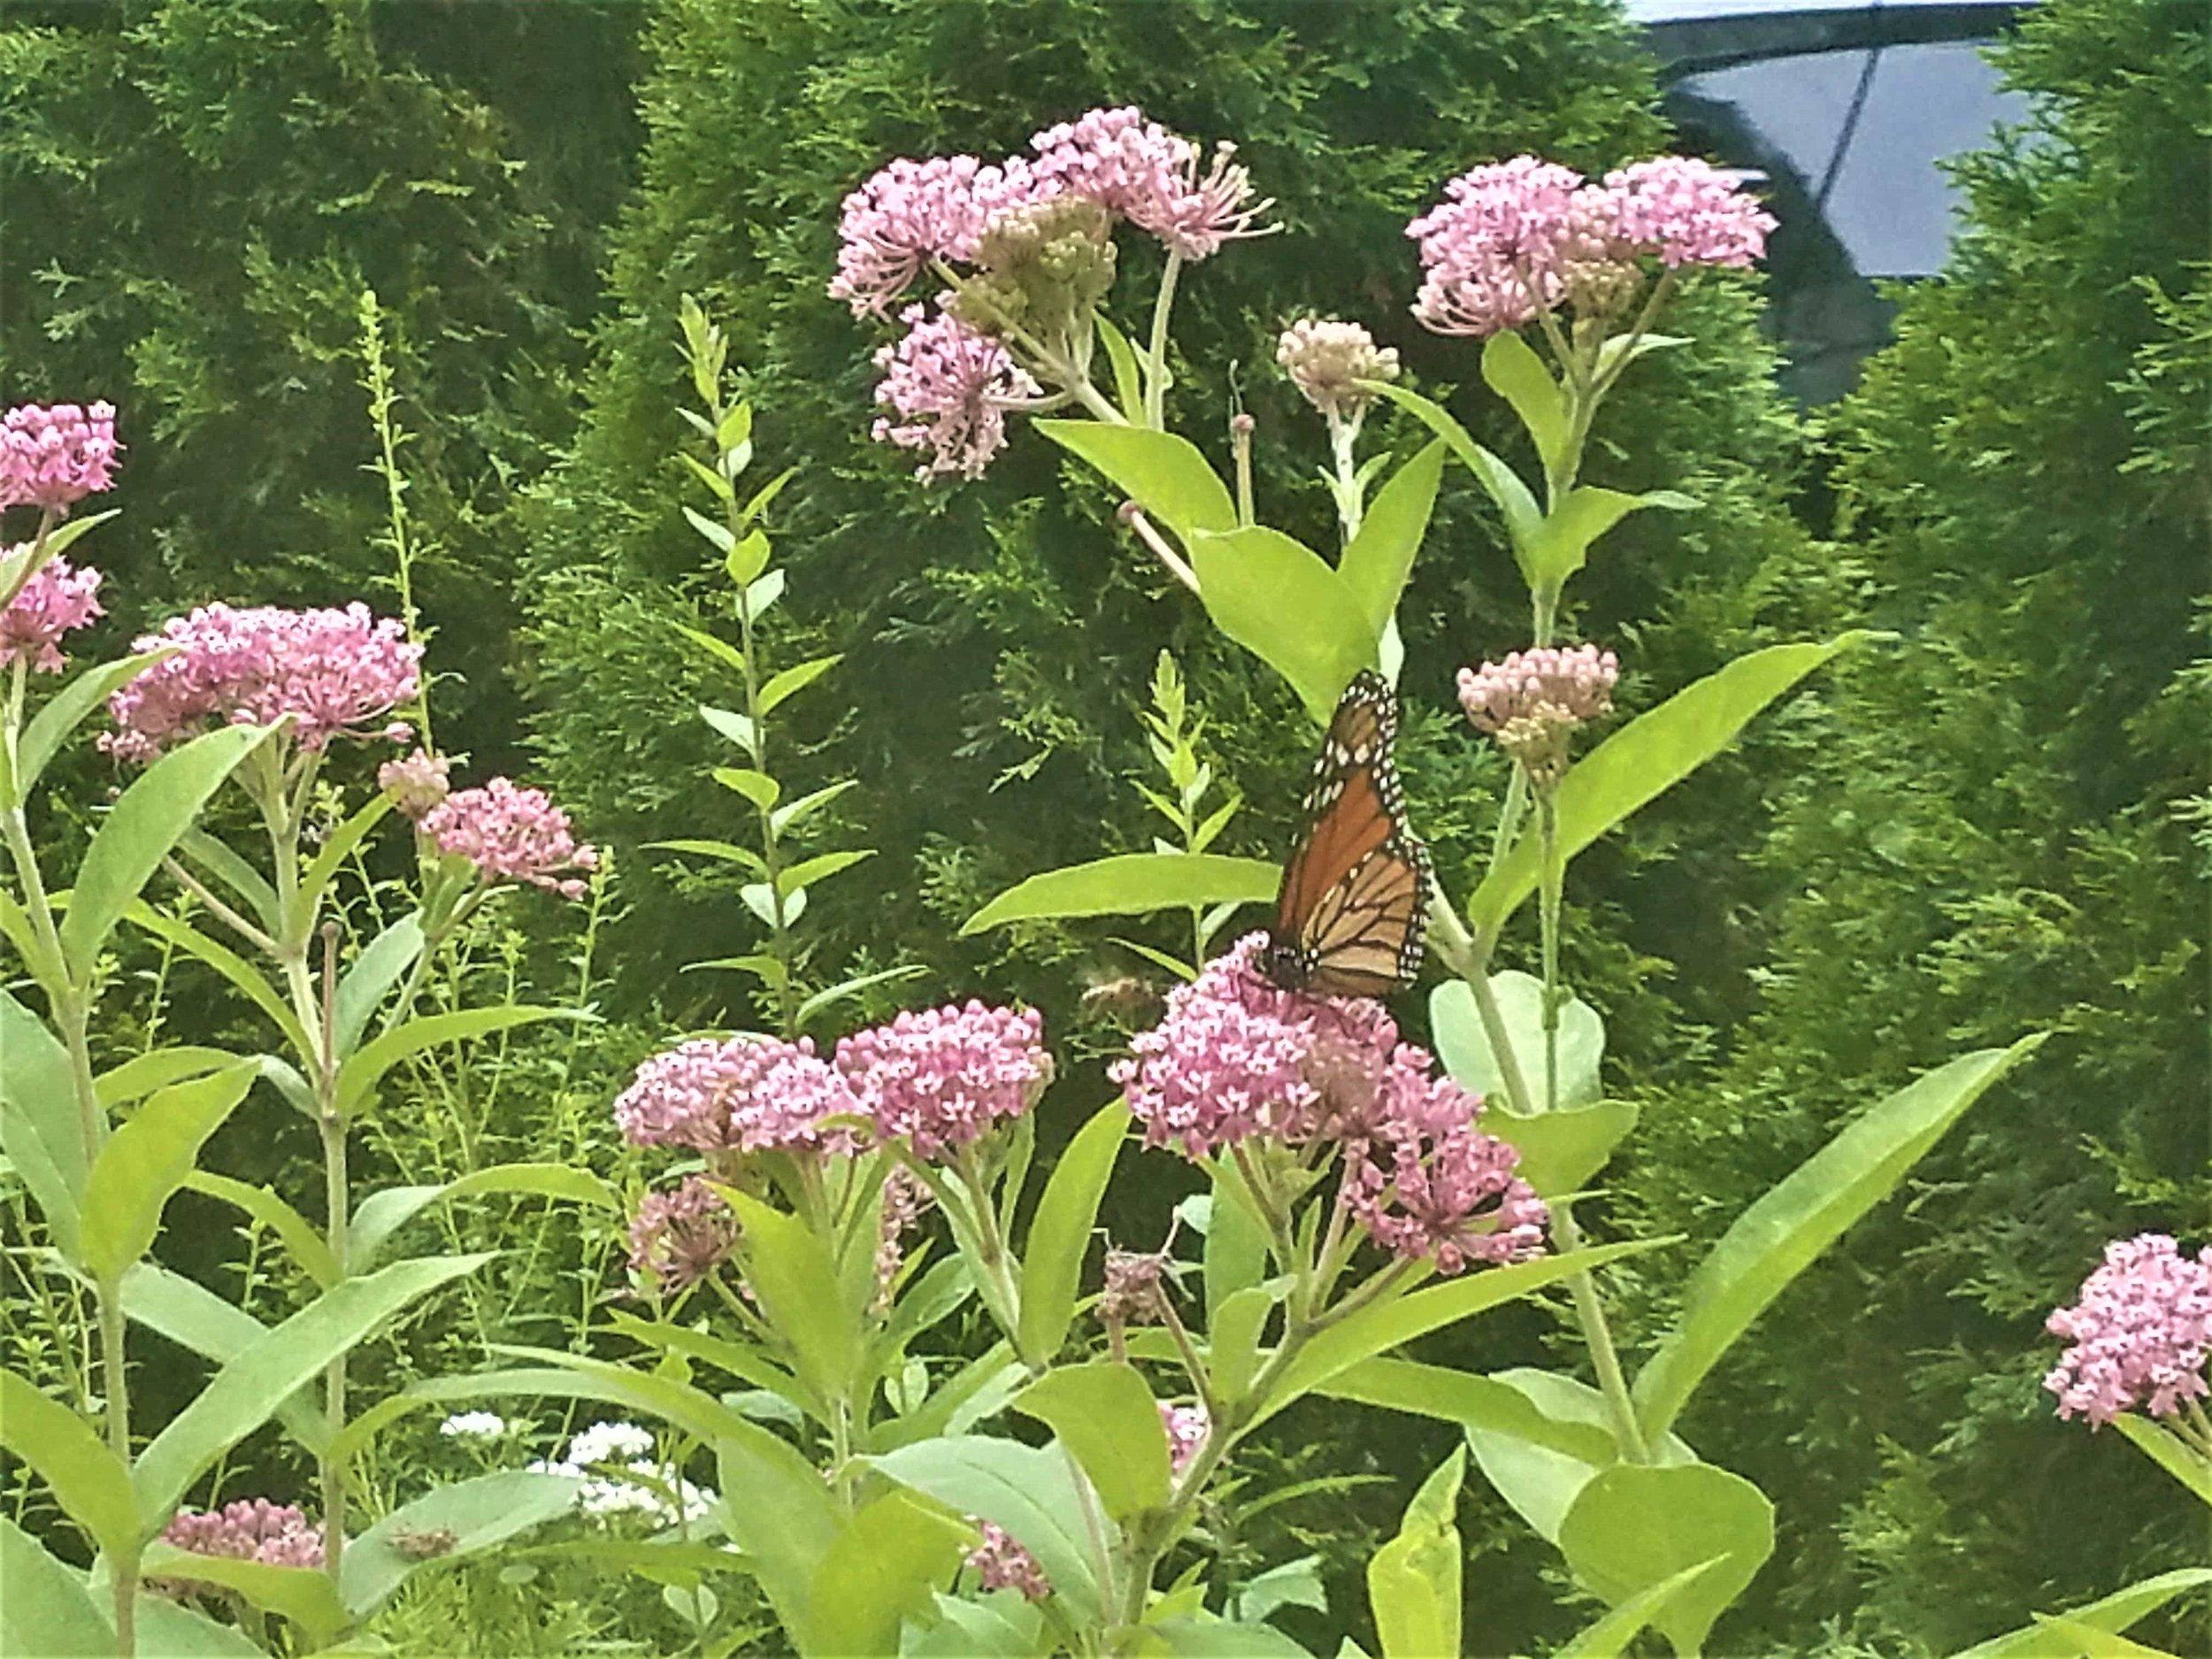 20170727_Monarch on Milkweed.jpg